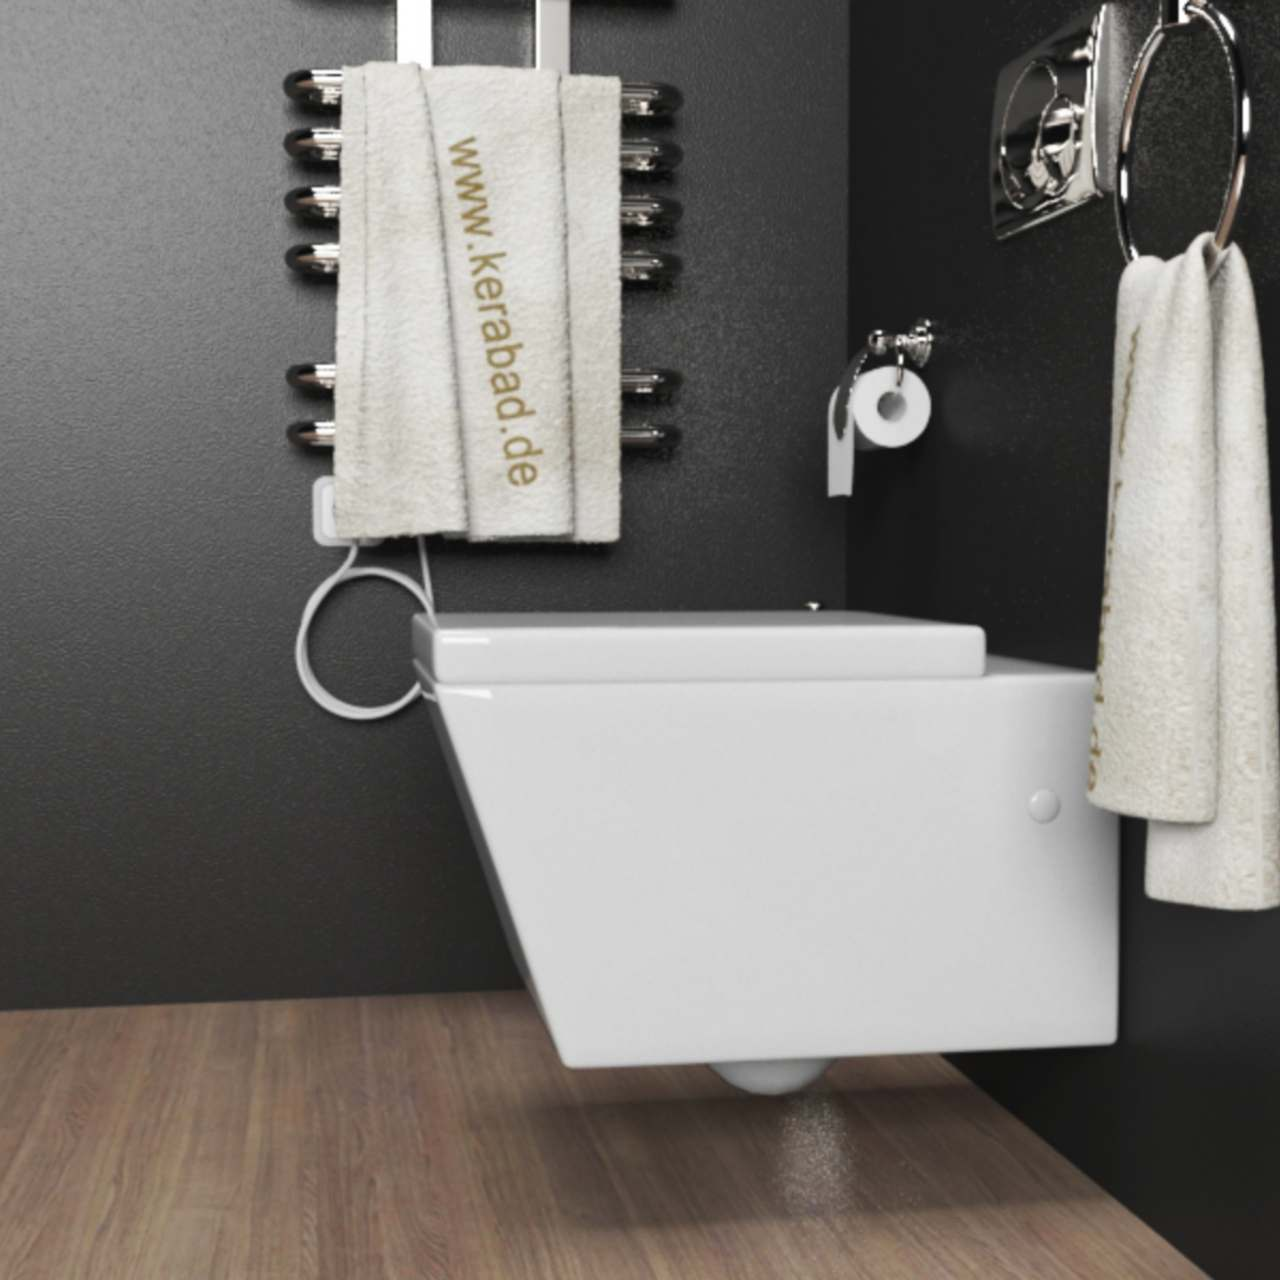 design wand h nge wc toilette inkl duroplast wc sitz mit absenkautomatik ebay. Black Bedroom Furniture Sets. Home Design Ideas